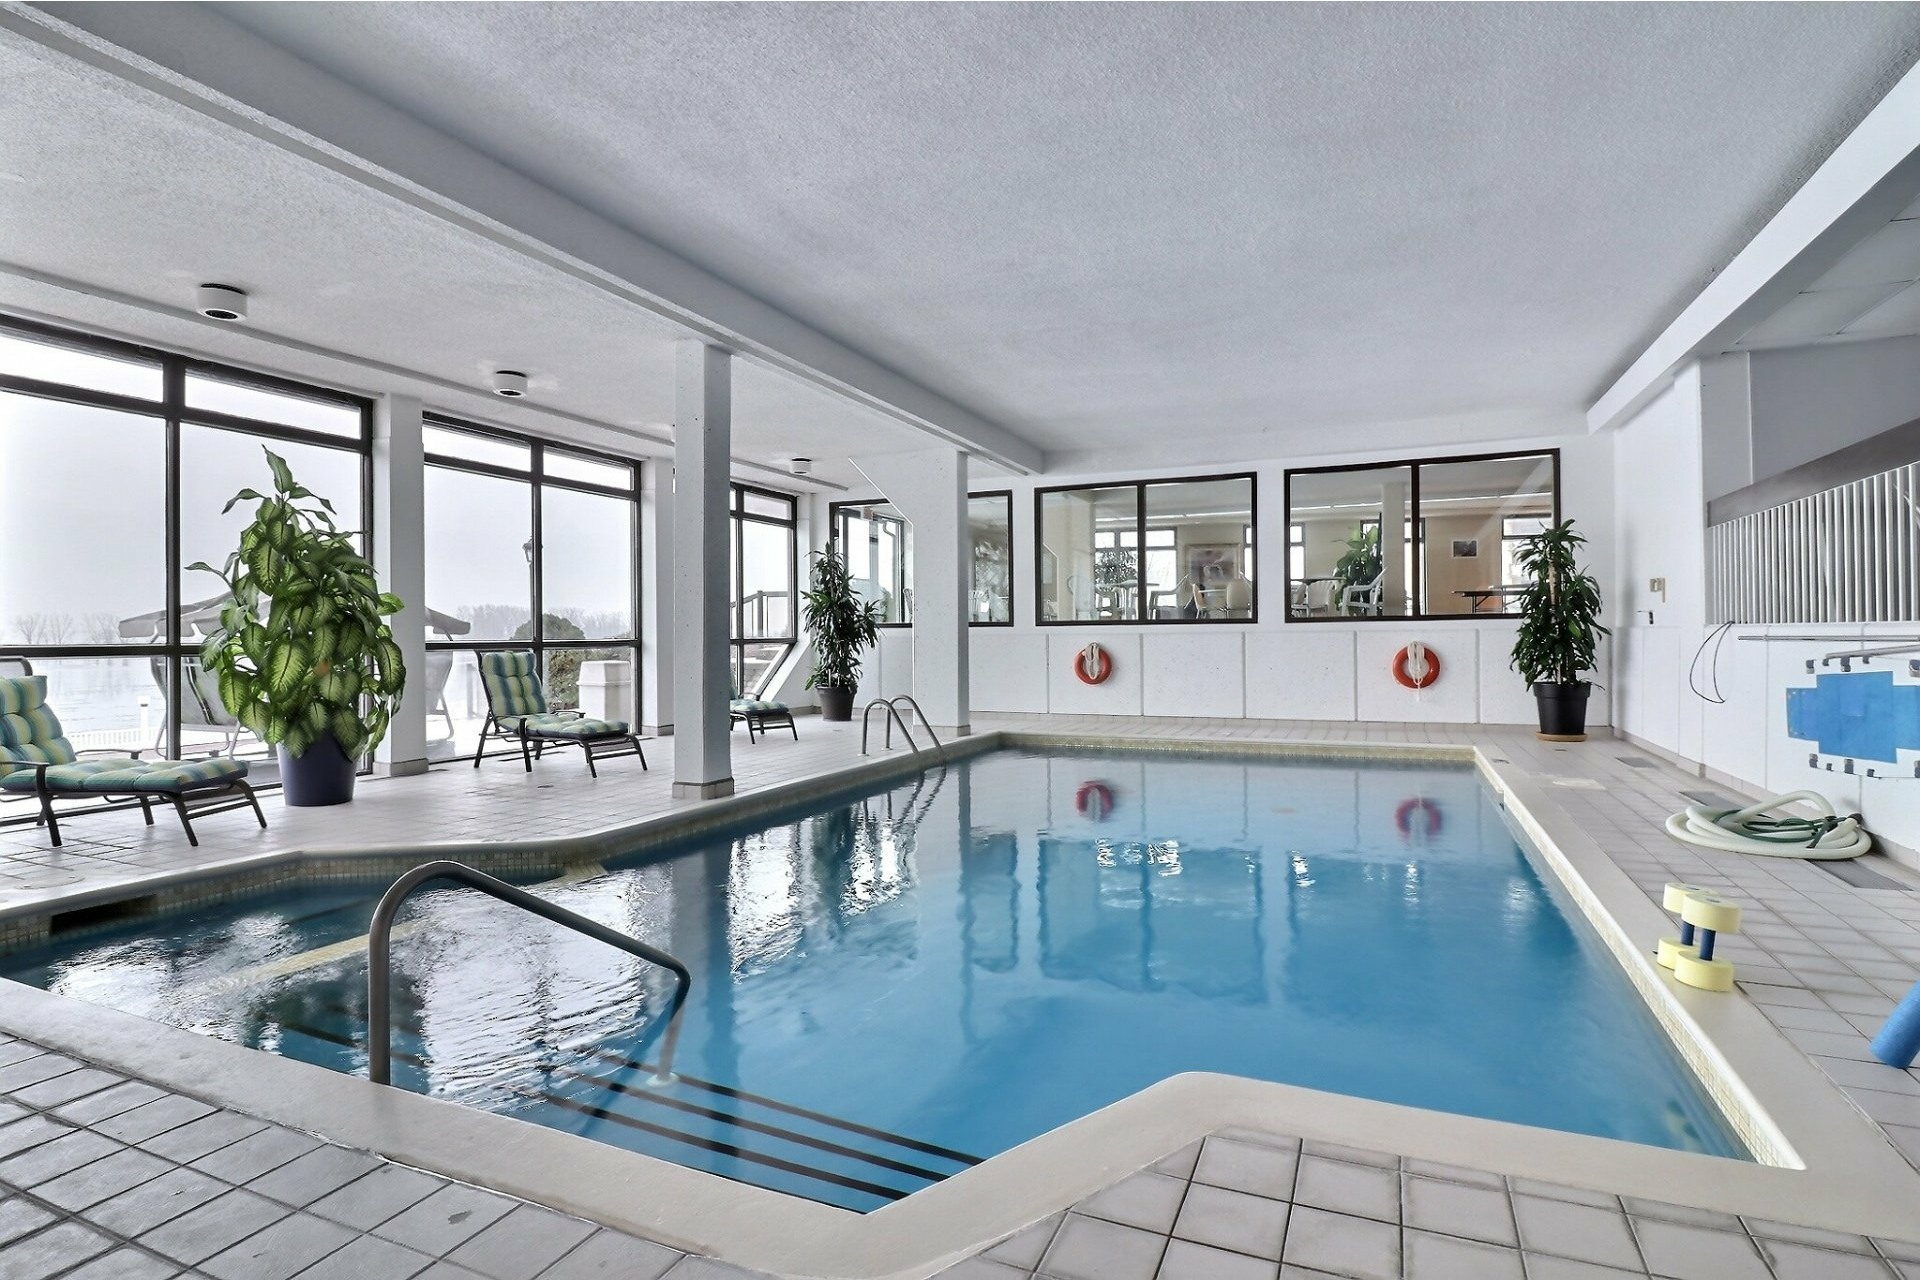 image 21 - Appartement À vendre Repentigny Repentigny  - 9 pièces